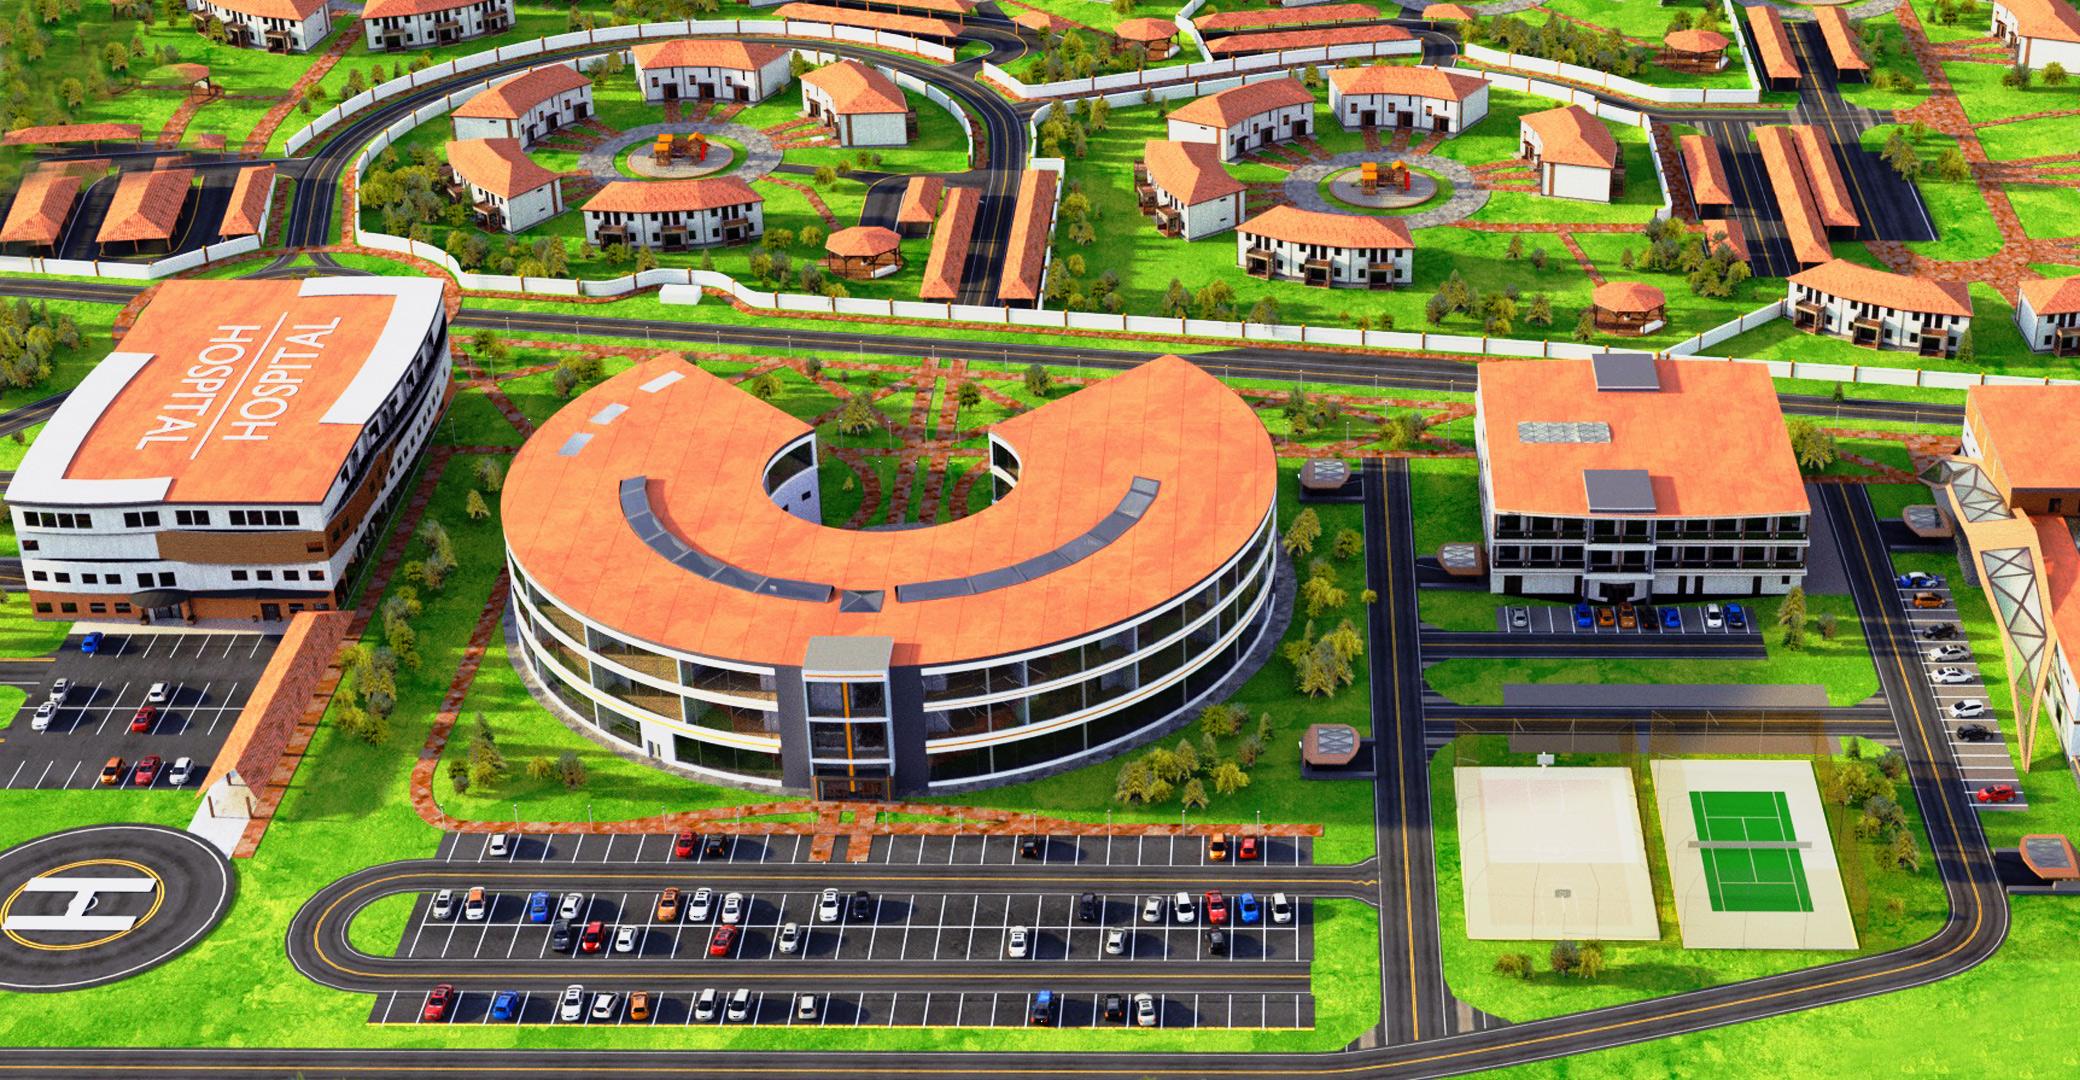 11,4ha pozemky DynastyComplex (ÚR)